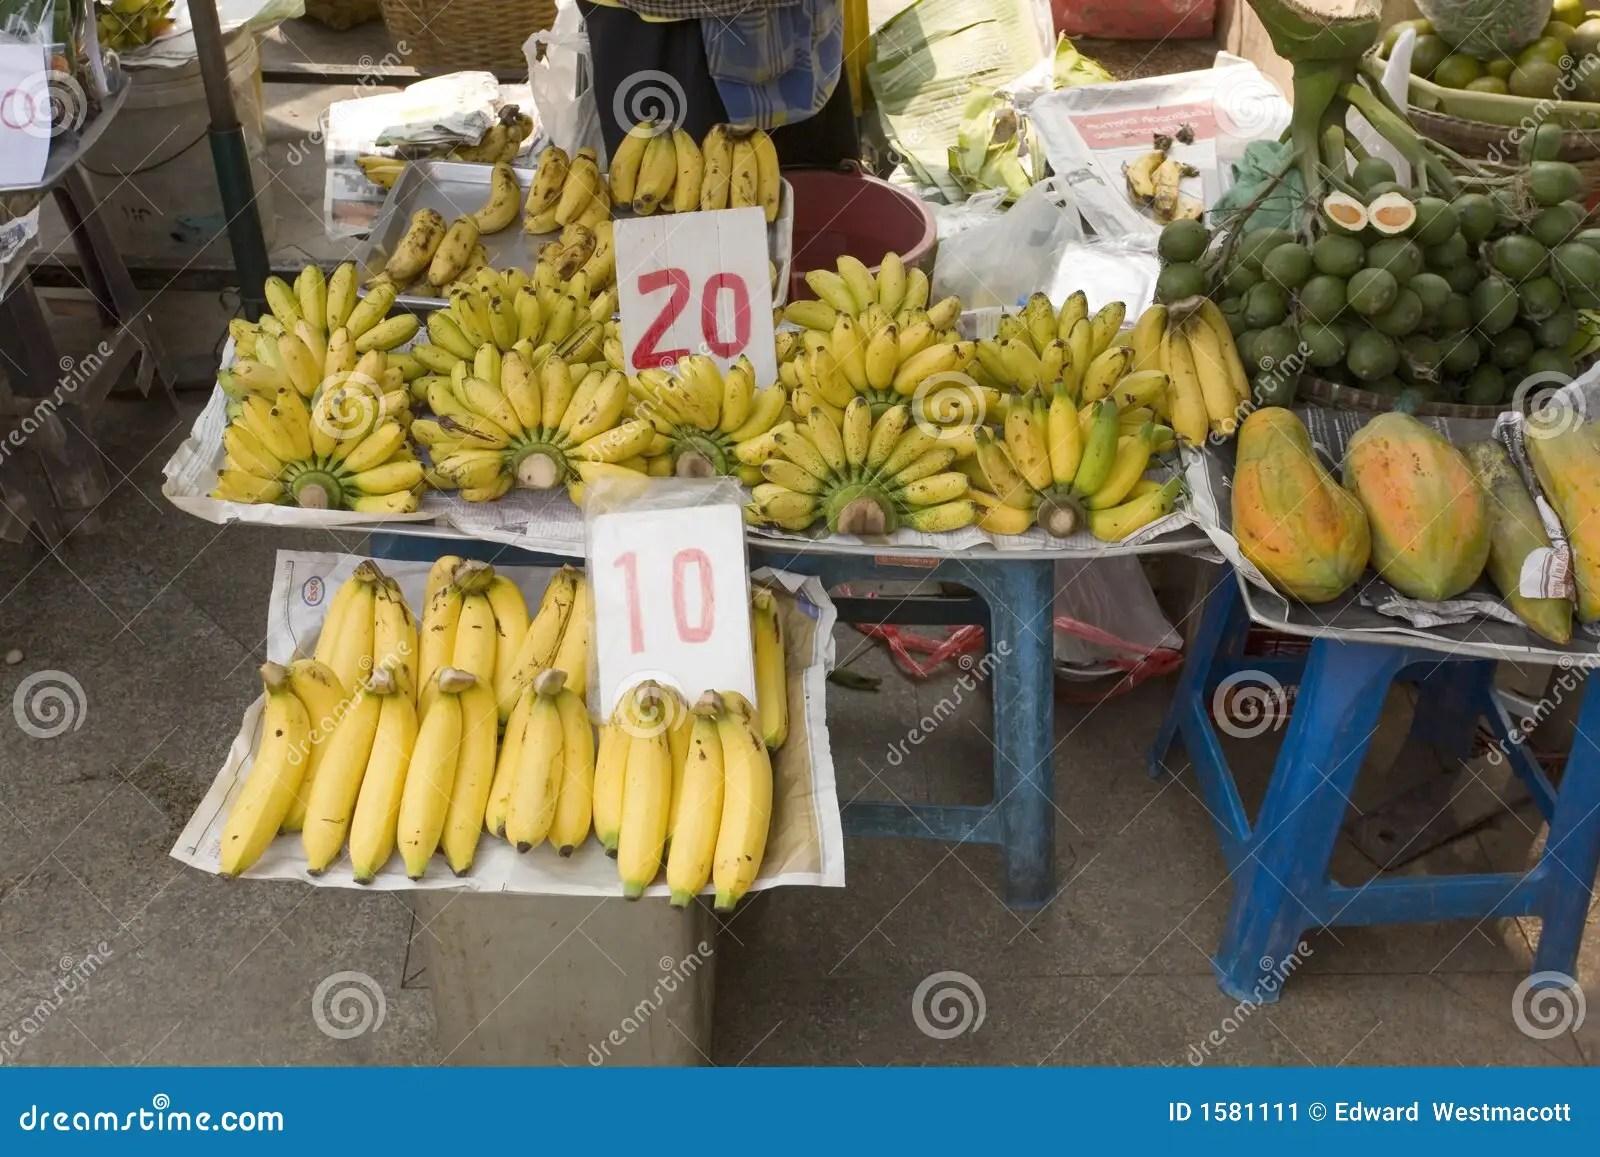 Market Stall Selling Bananas Stock Image Image Of Food